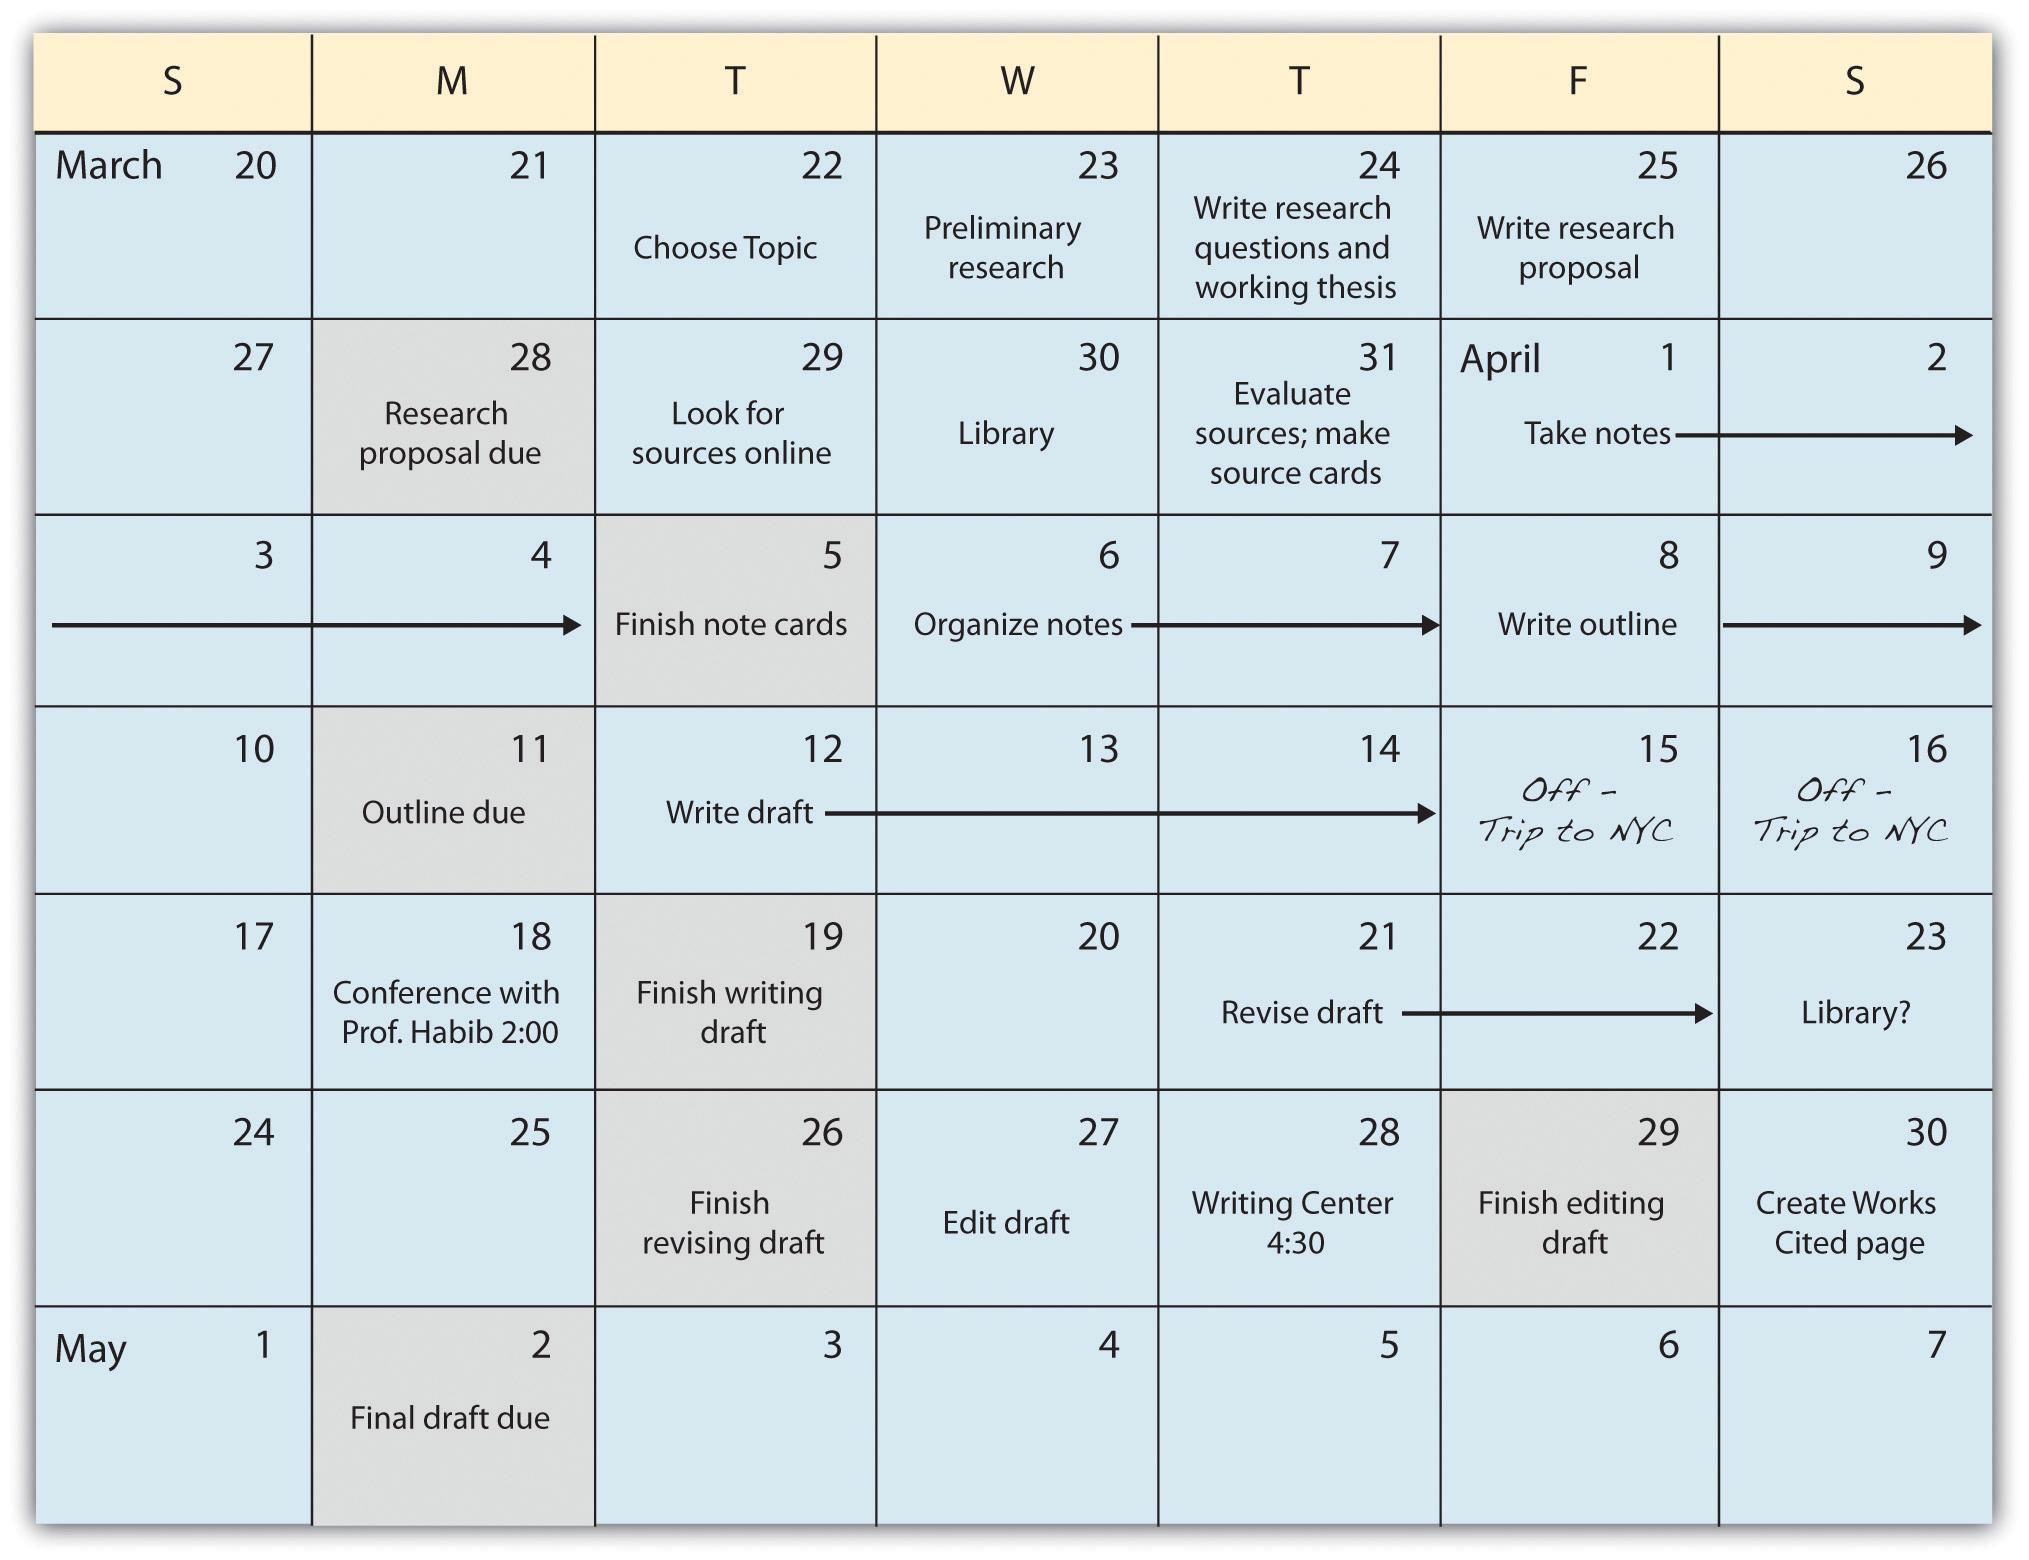 Jorge's schedule